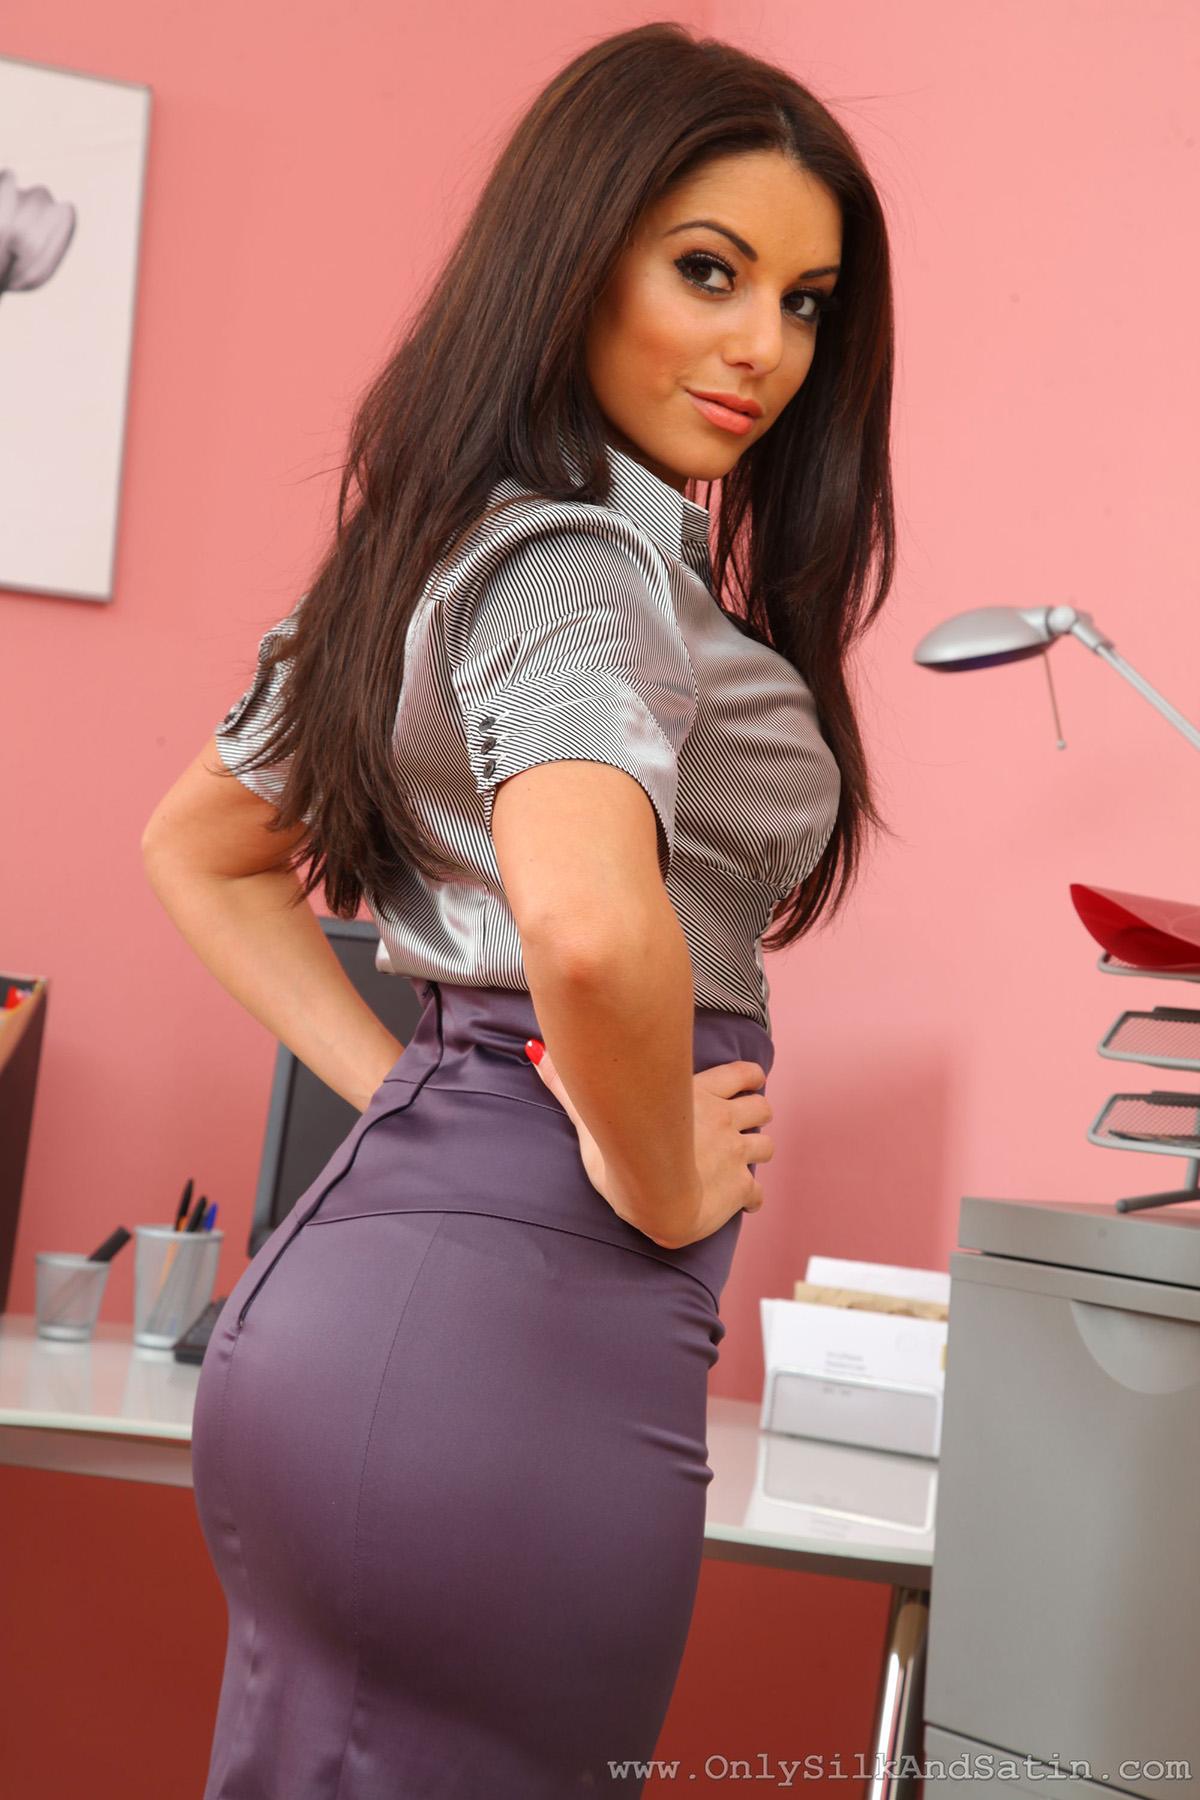 Charlotte Springer Secretary Pantyhose Onlysilkandsatin 03 Redbust-4781